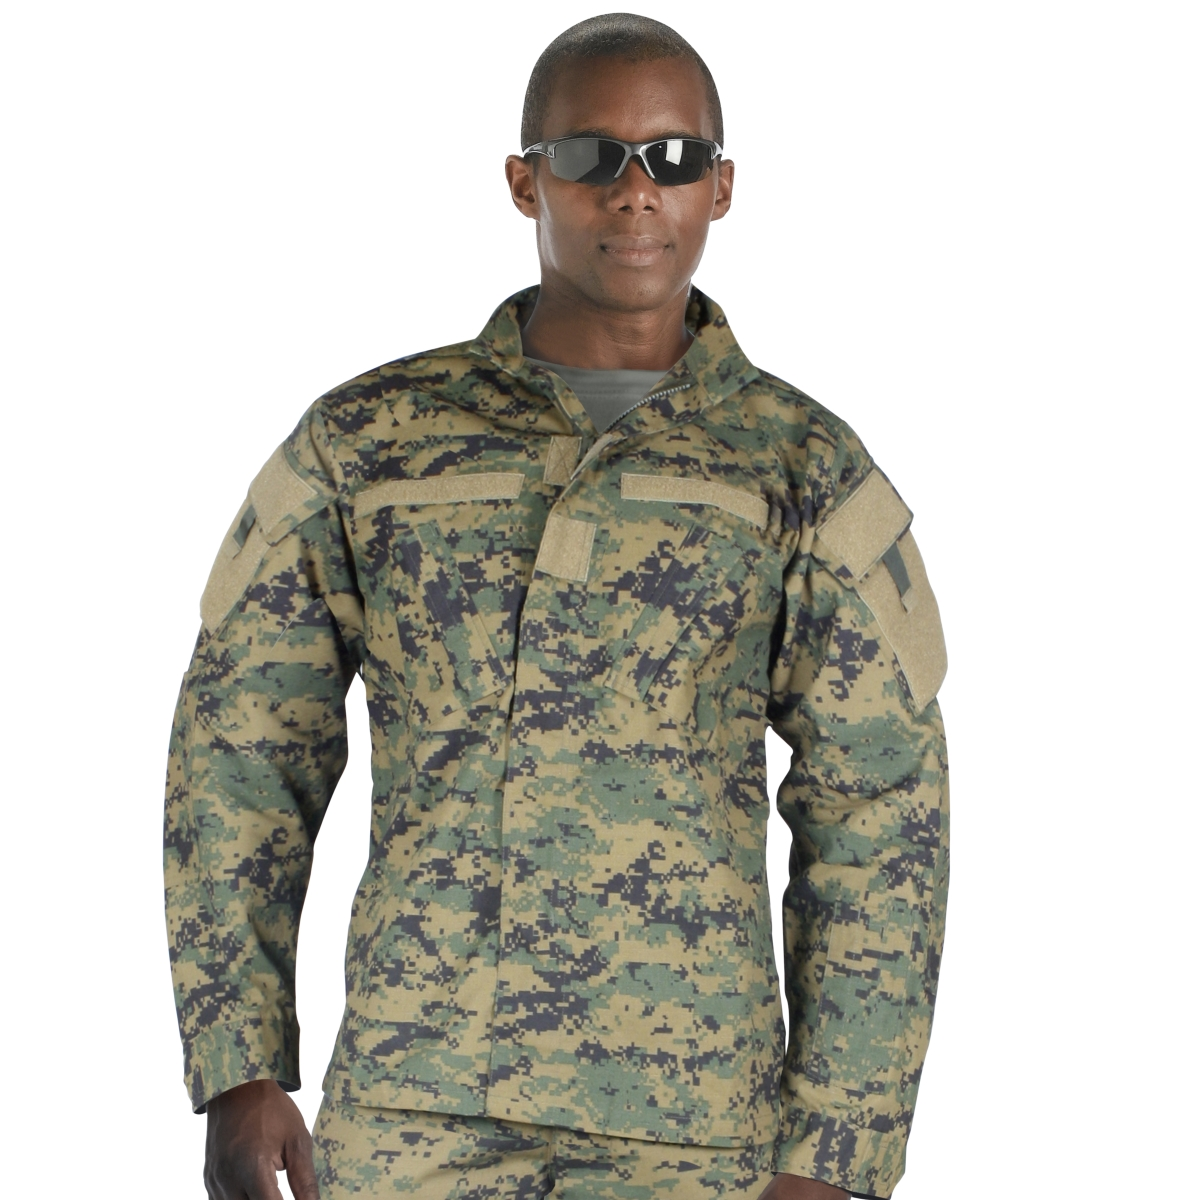 Nwu Uniform Prices 44